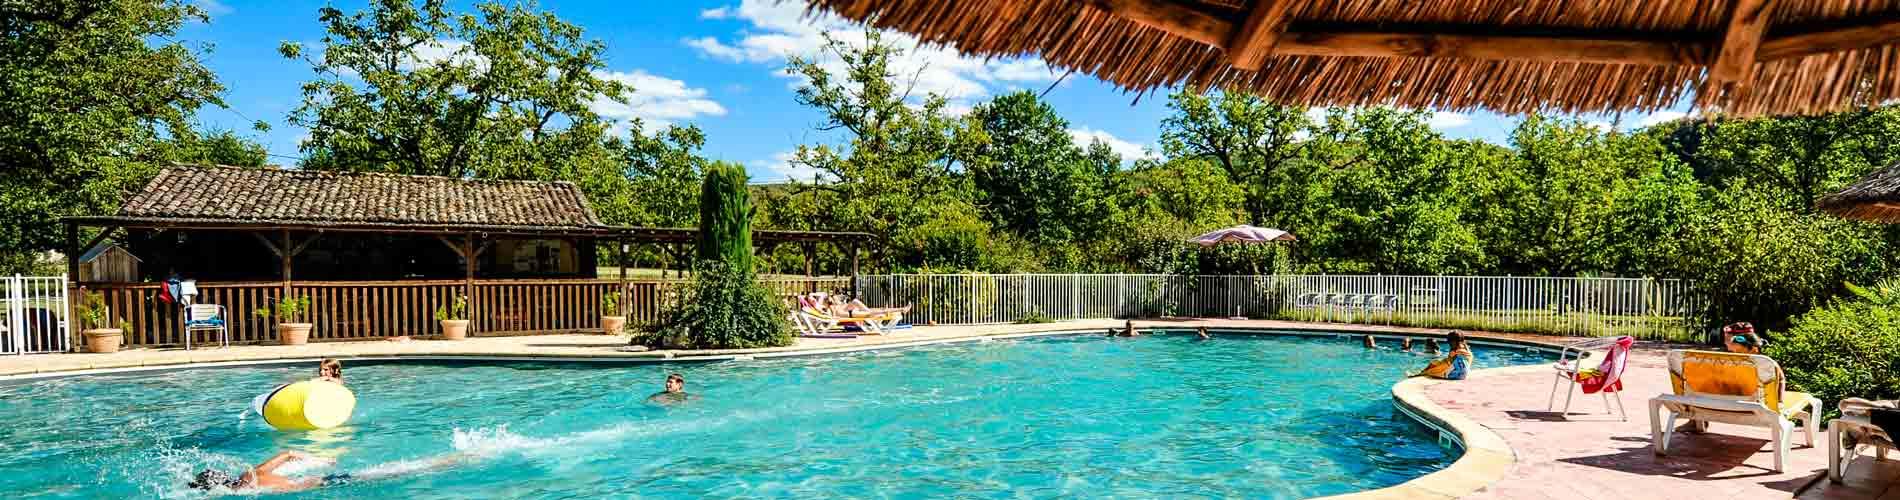 Camping lot avec piscine camping avec espace quatique for Camping municipal dordogne avec piscine